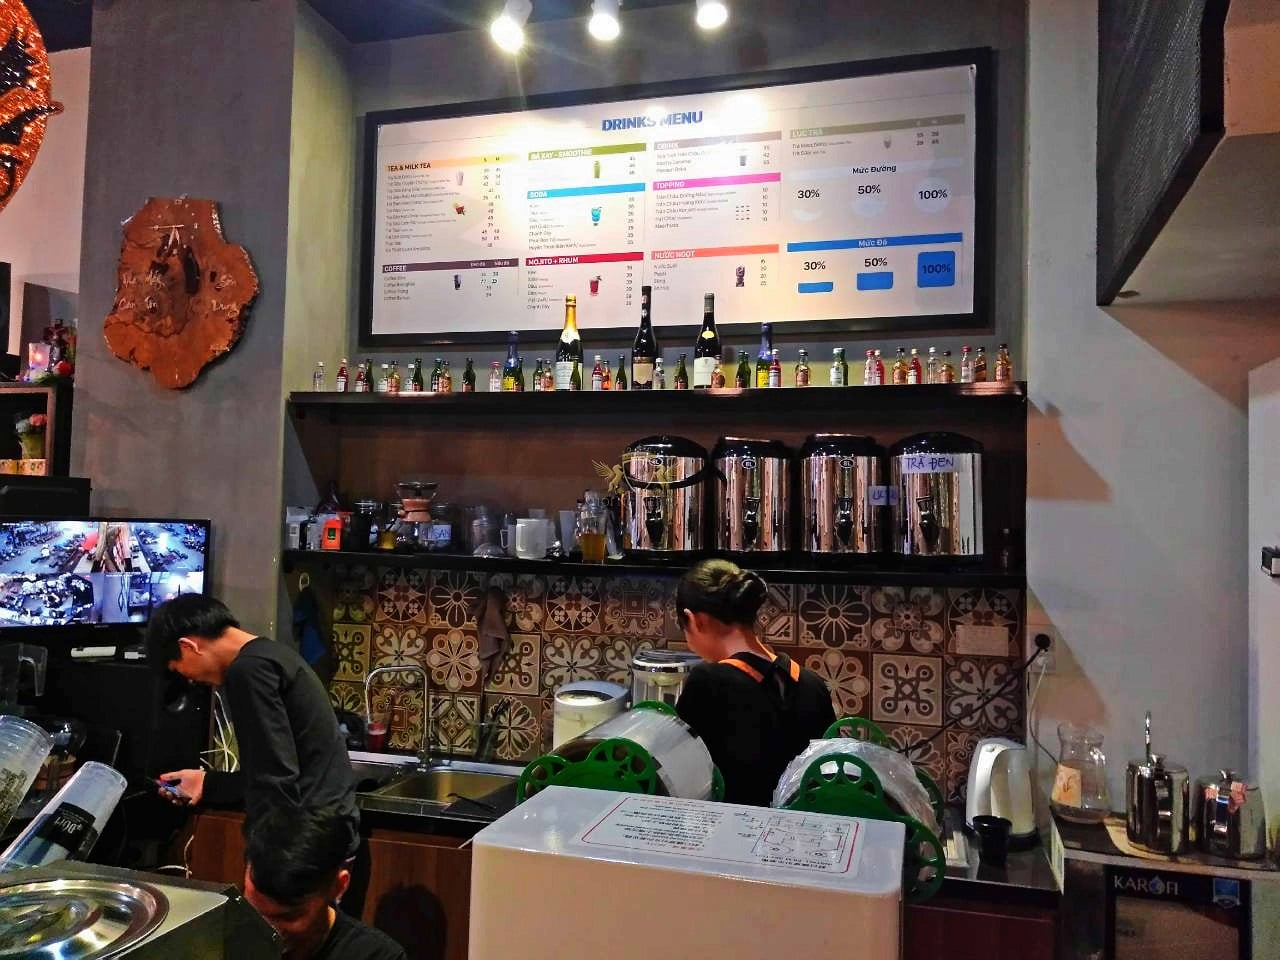 Dom Cafe Go Vap mua ban may pha cafe chuyen nghiep cua y Faema E98 RE A2 HC600 khoi nghiep cafe 2